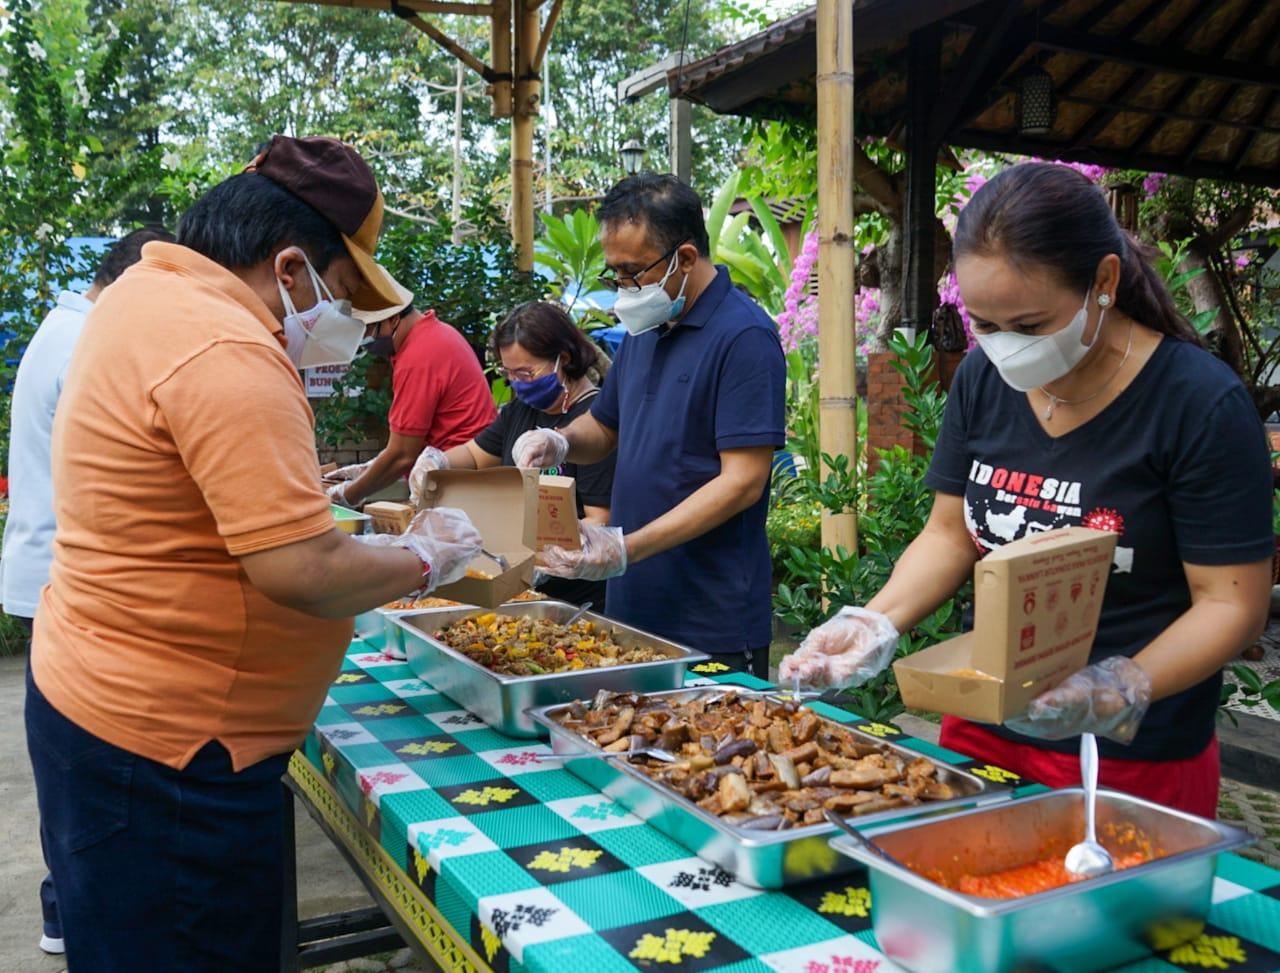 WALI Kota Jaya Negara bersama Alumni SMAN 1 Denpasar (Smansa) Angkatan 85 saat aksi sosial di Dapur Umum Gotong Royong Kota Denpasar diJalan Kaliasem, Minggu (8/8/2021). Foto: ist